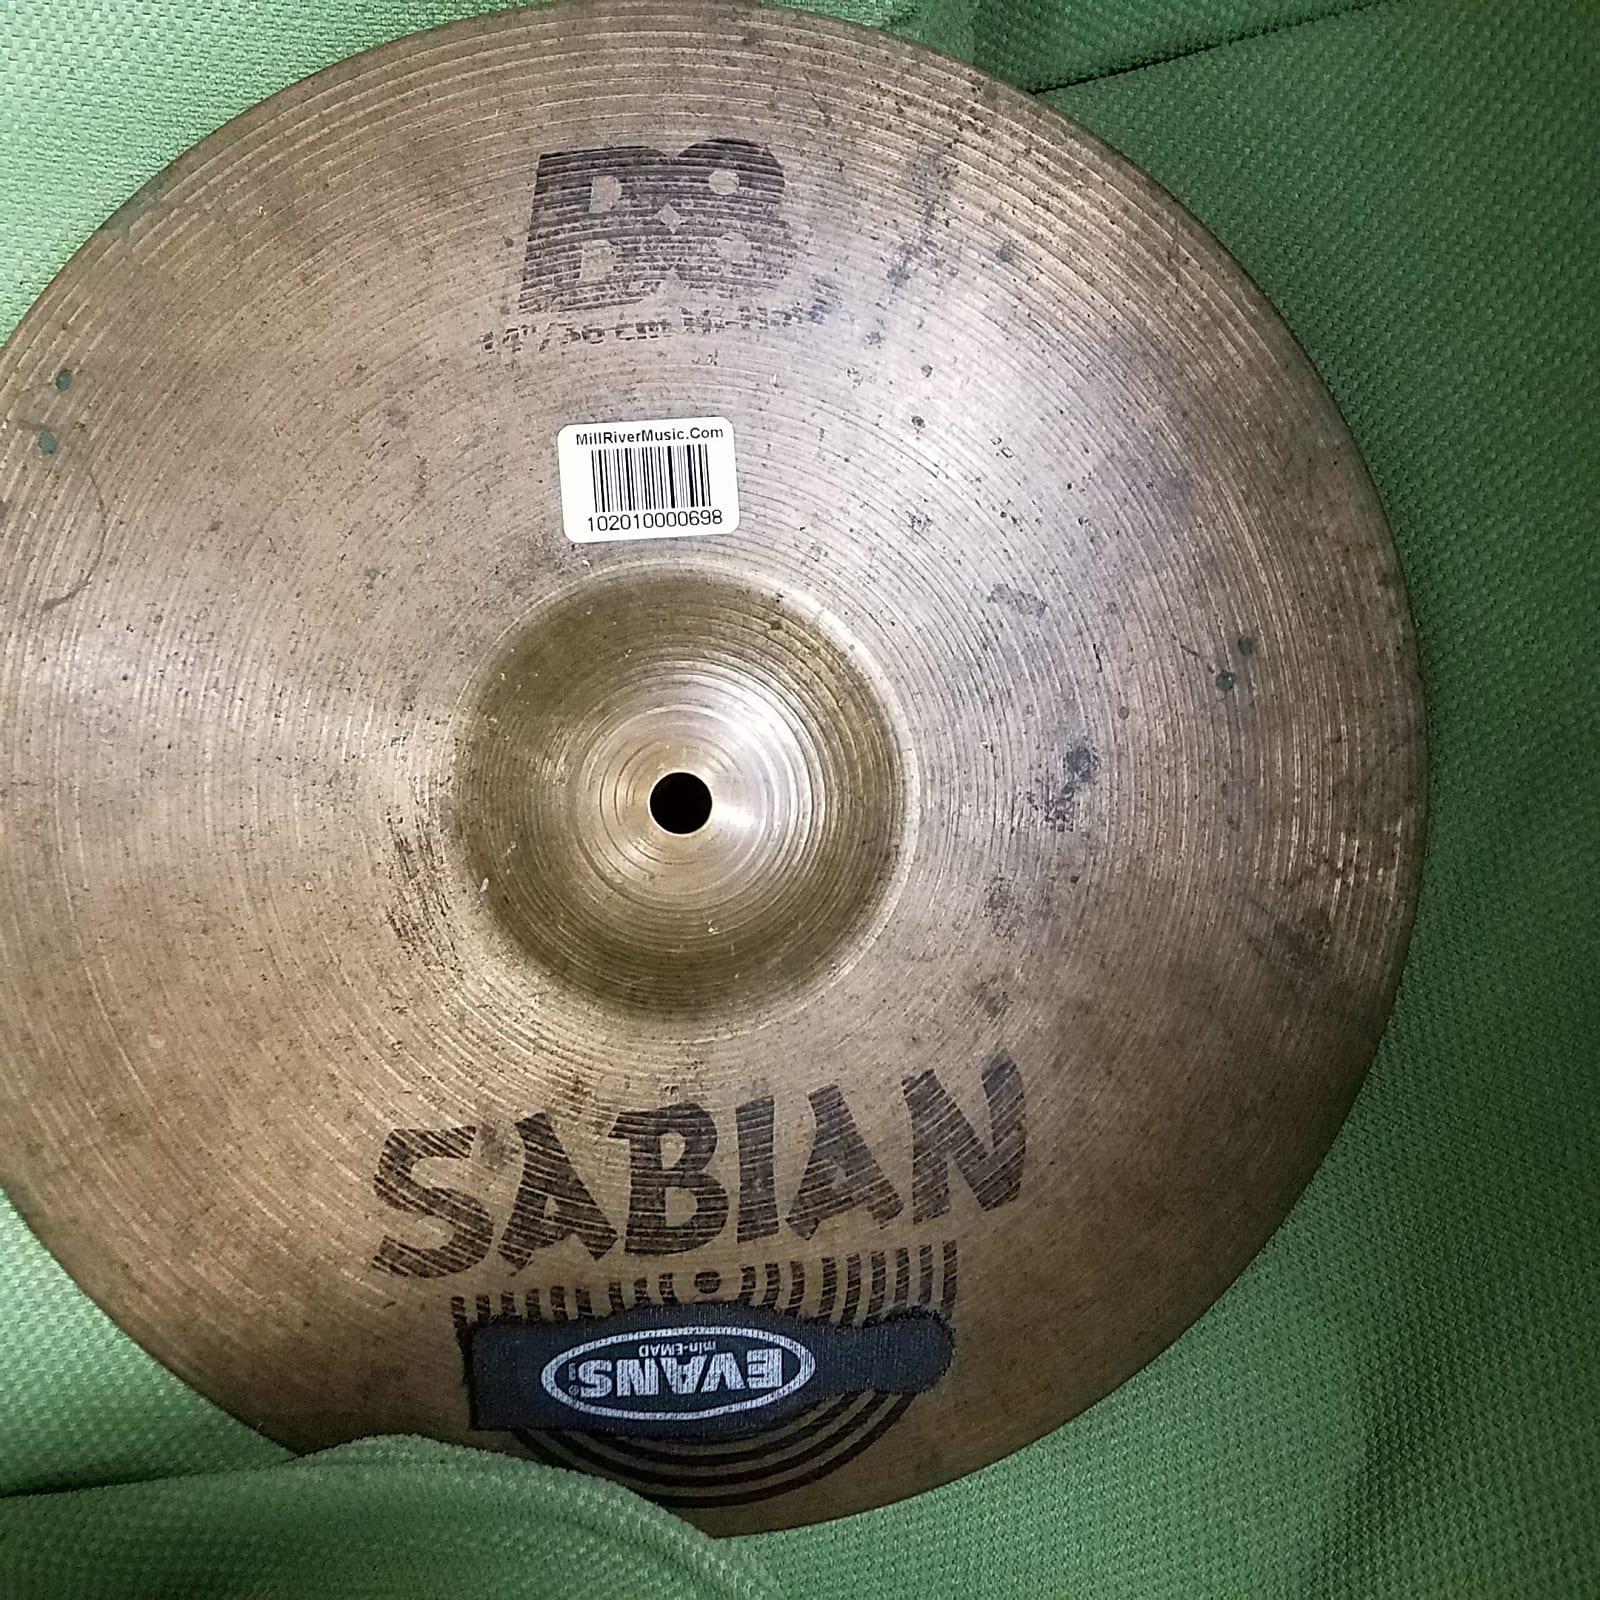 Sabian B8 Pro 14